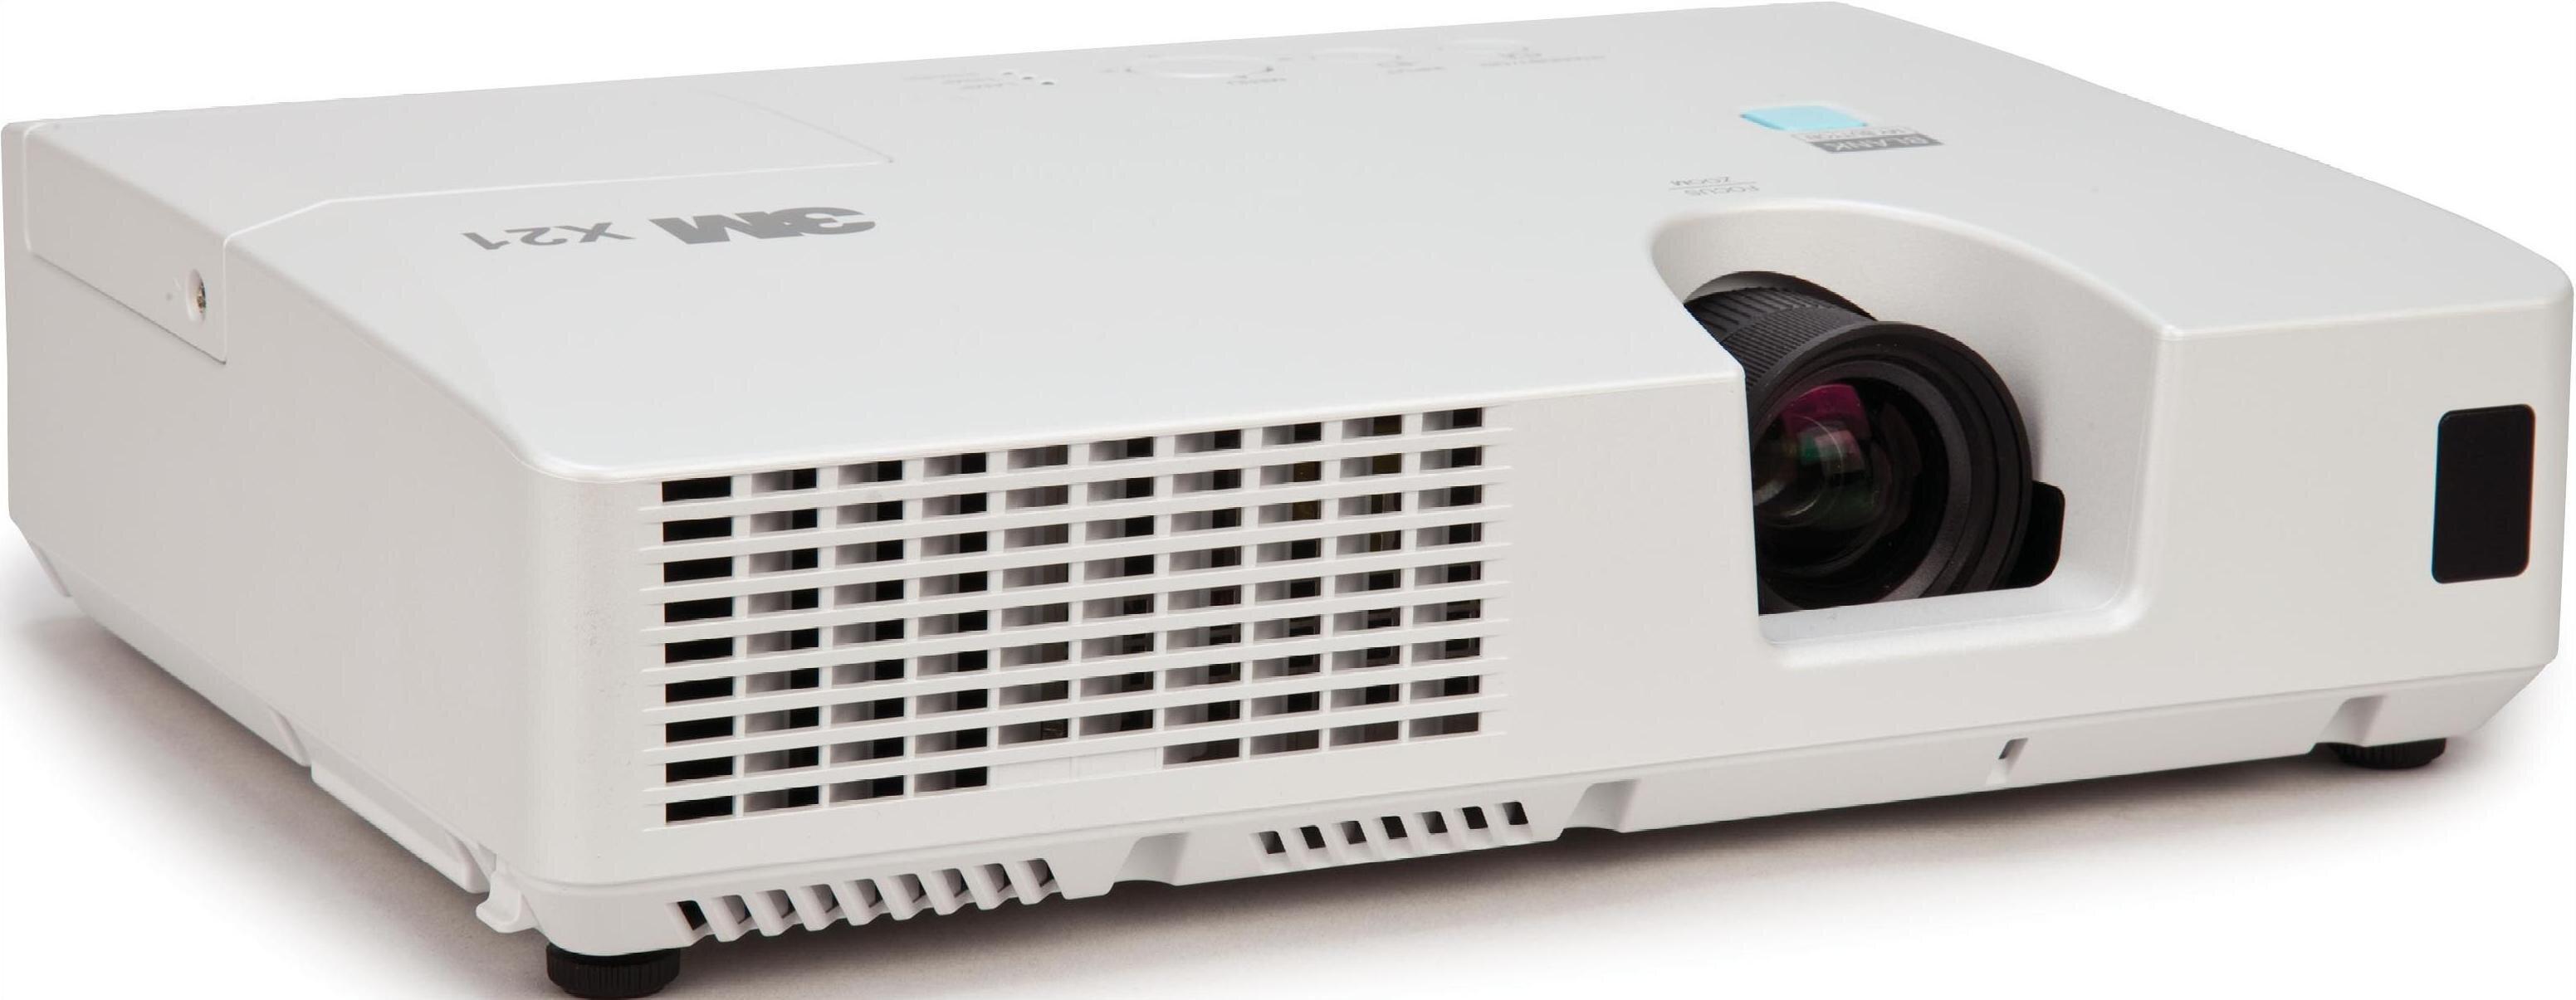 Máy chiếu 3M X21 - 2700 lumens